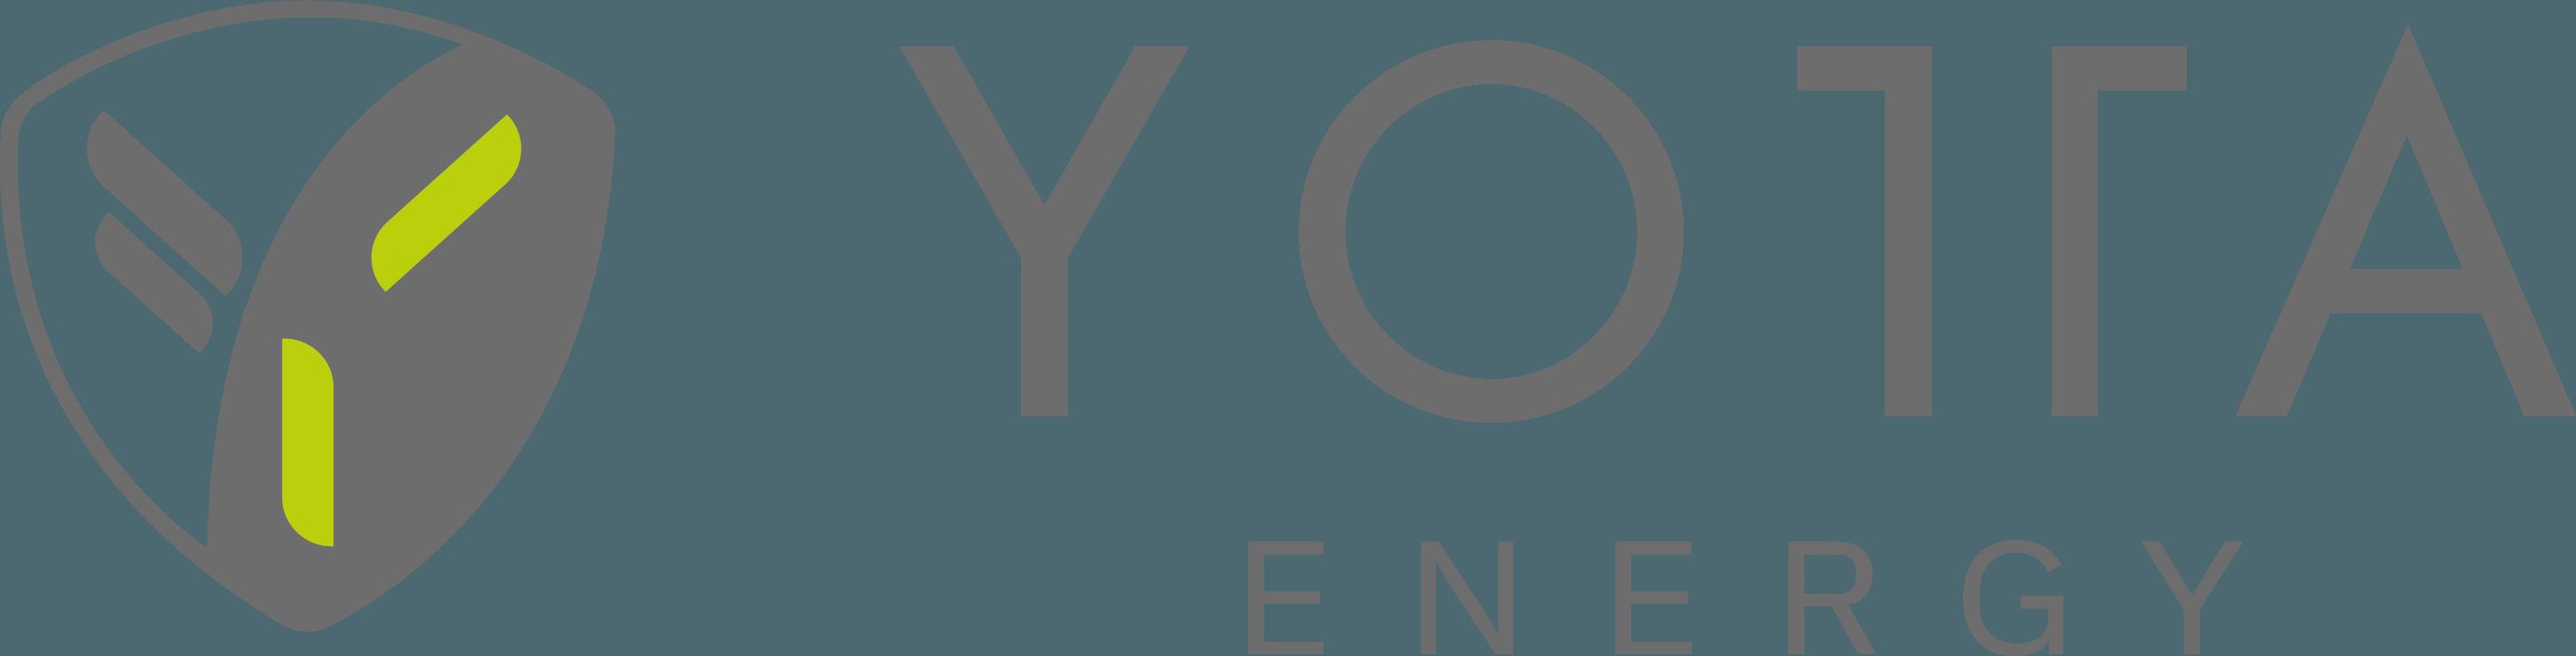 Yotta Energy Logo_Horizontal_Full Color